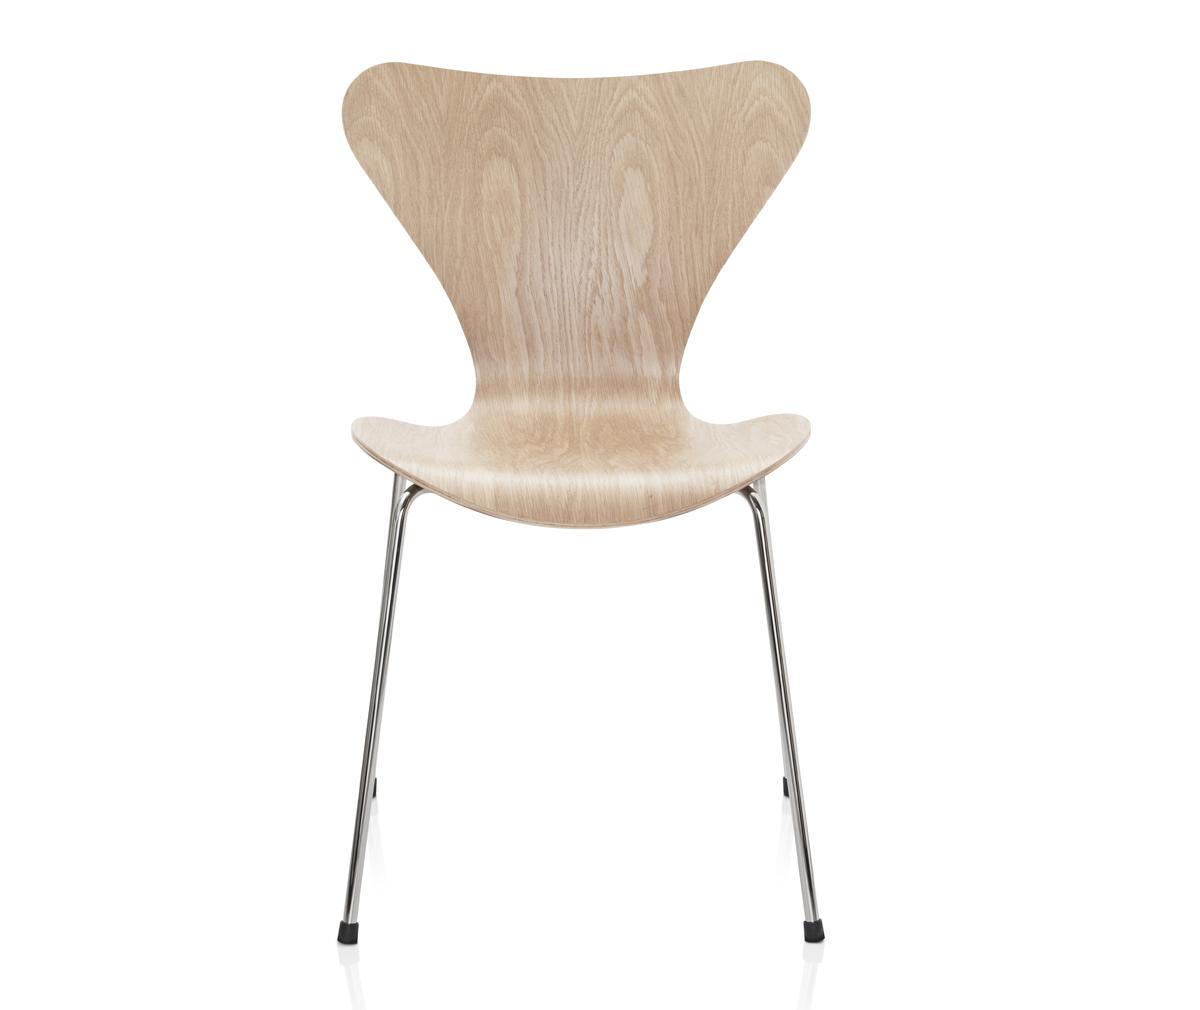 seiska tuoli 3107 tammi kromi veps l inen. Black Bedroom Furniture Sets. Home Design Ideas